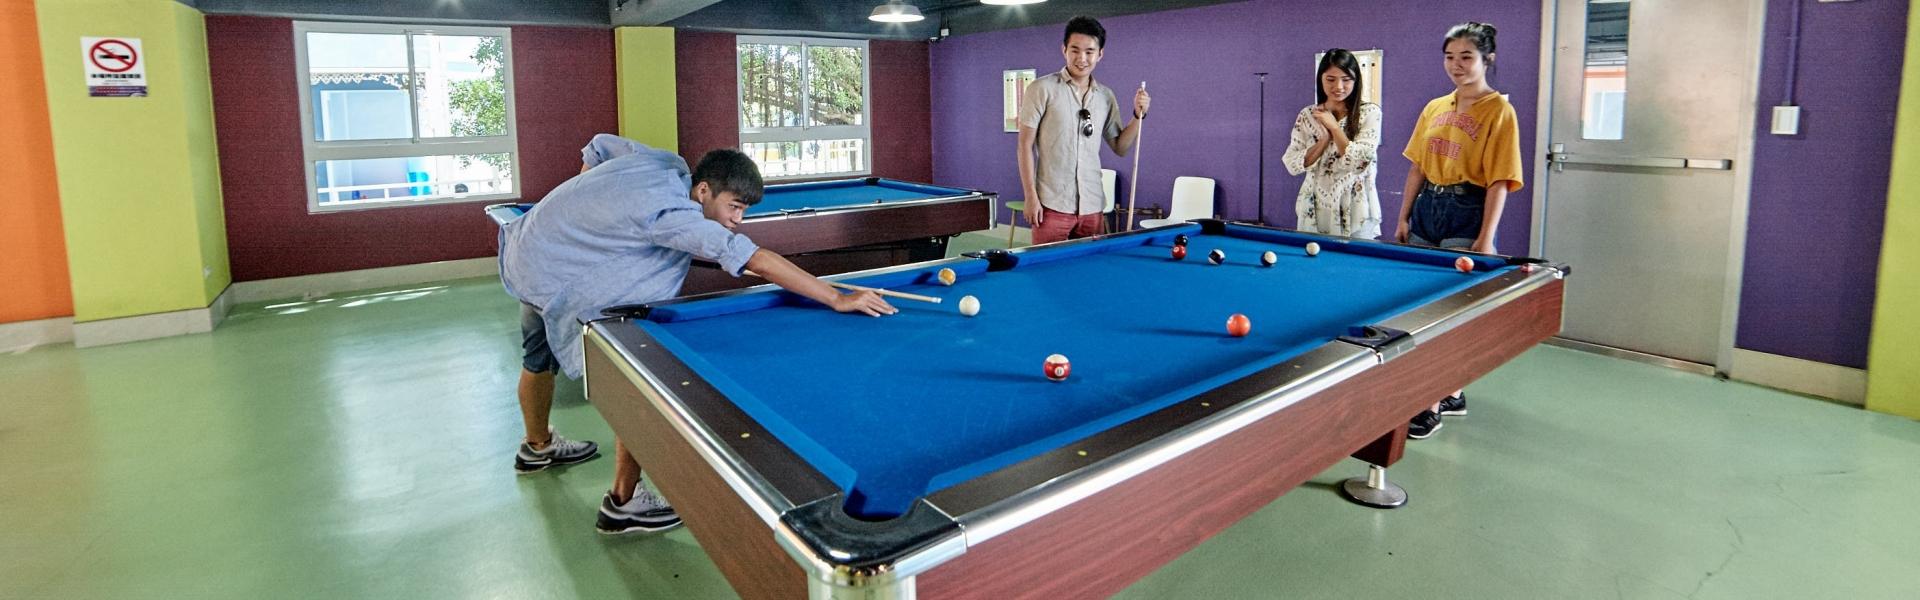 Ping pong table, billiard table